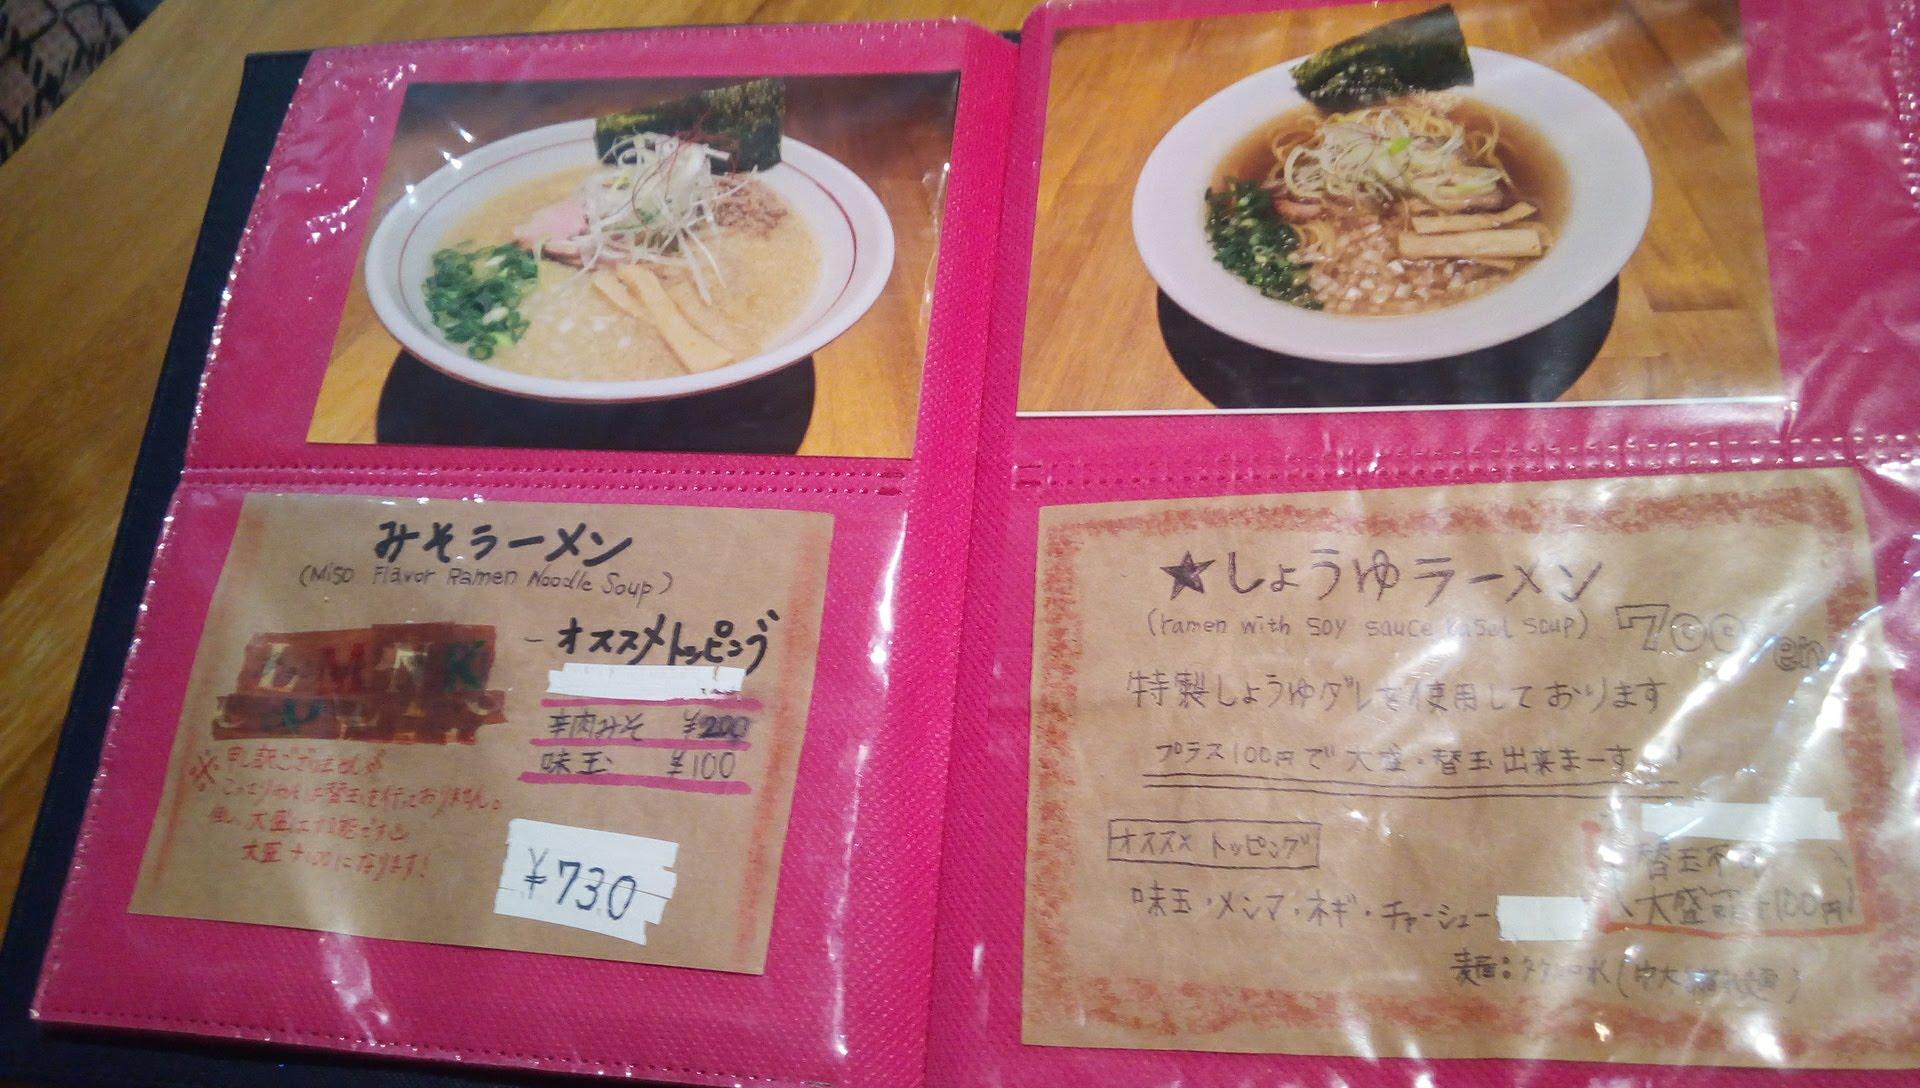 The menu of Menya-Gochi 2